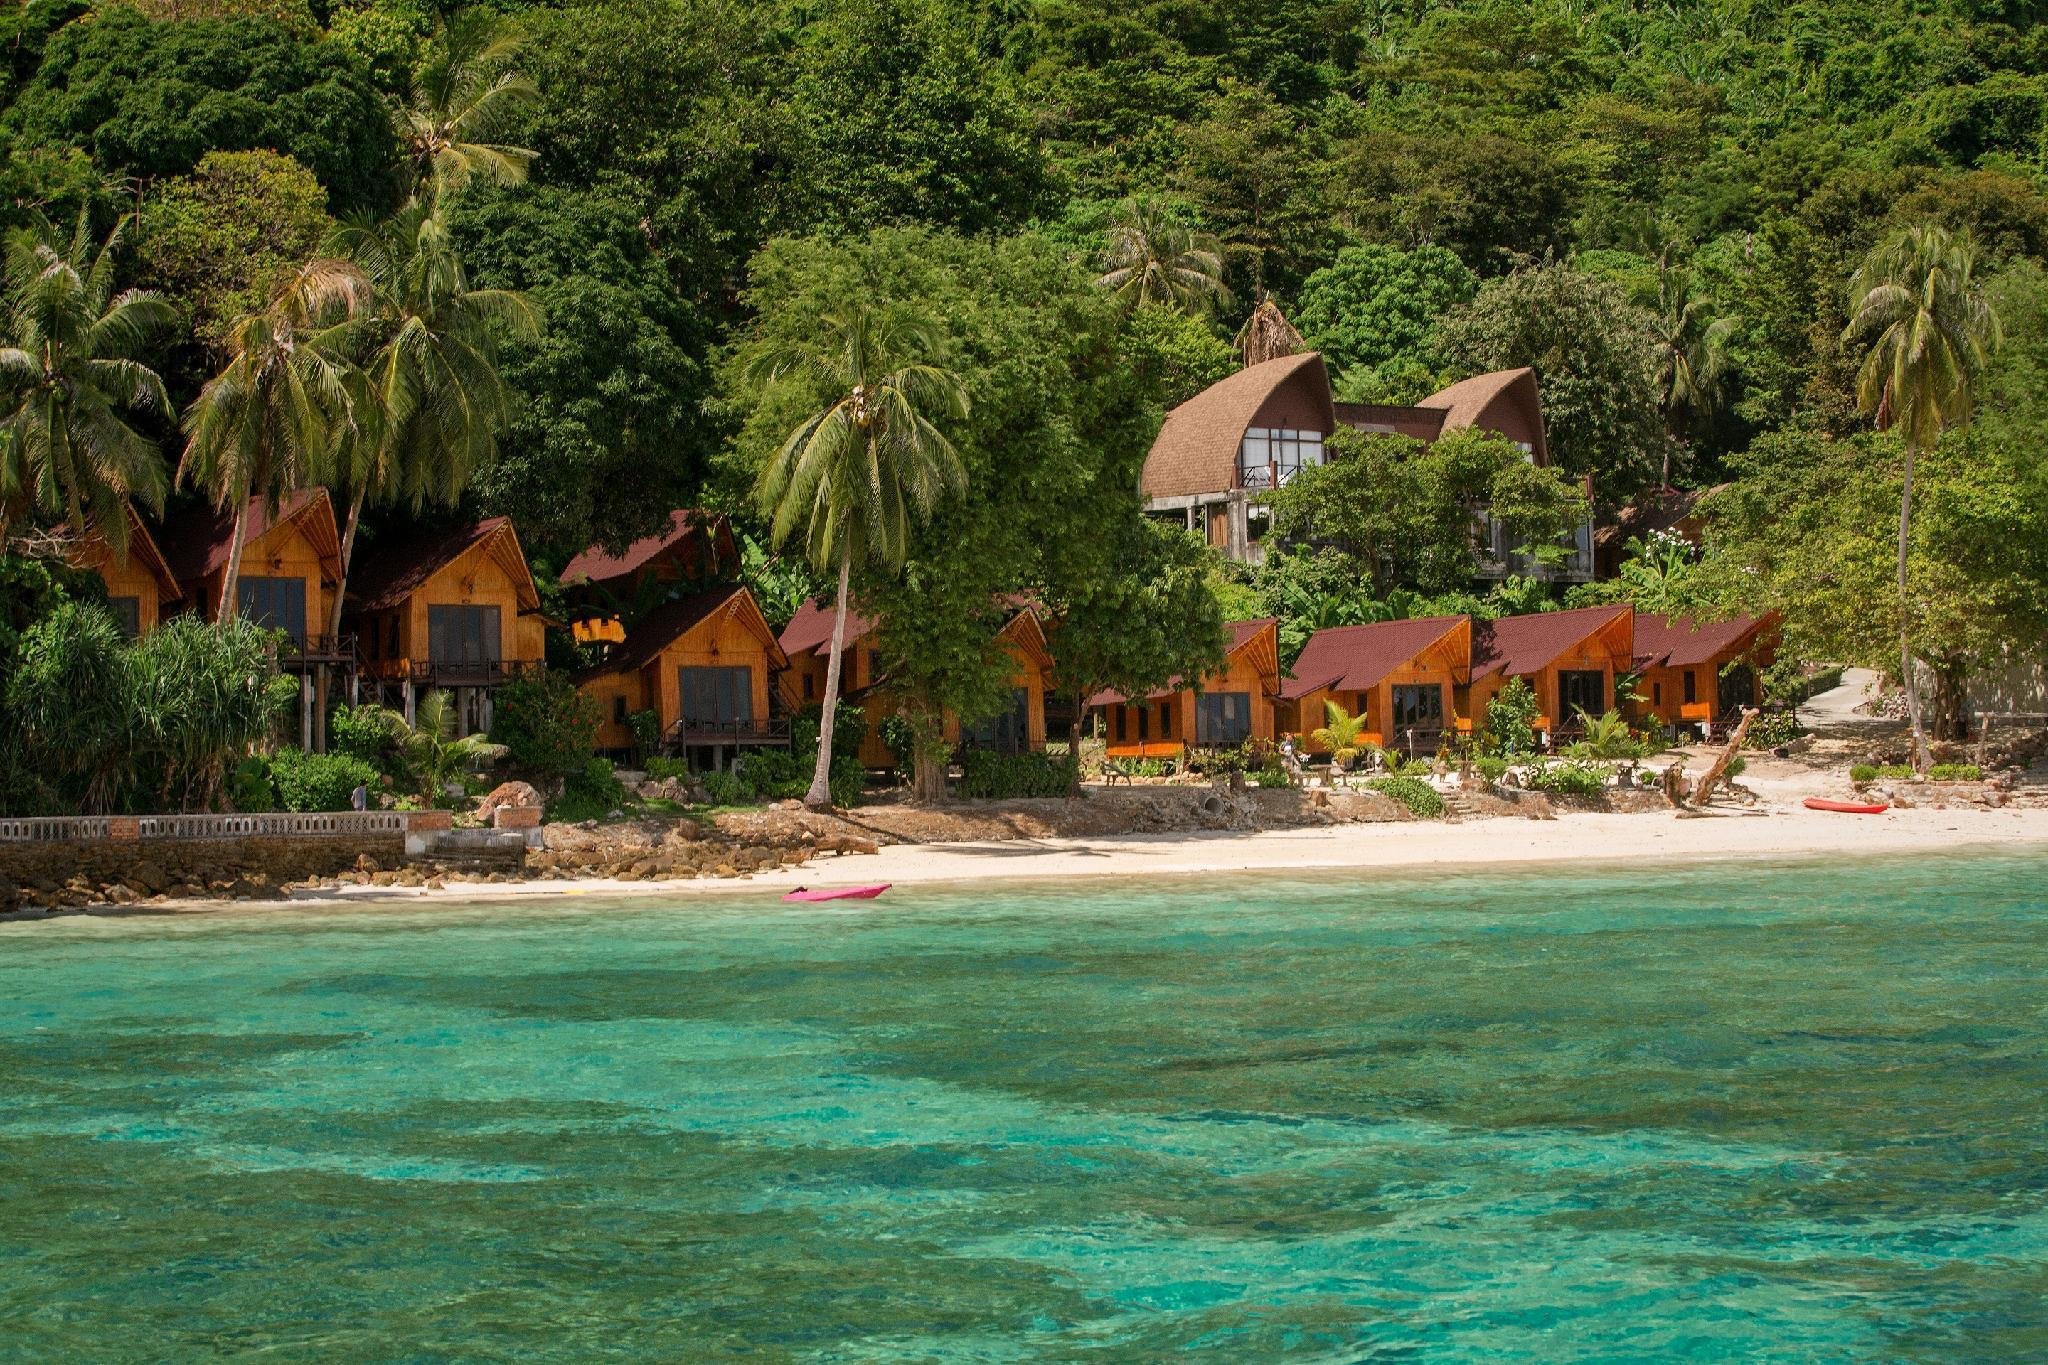 The Cove Phi Phi เดอะโคฟ พีพี